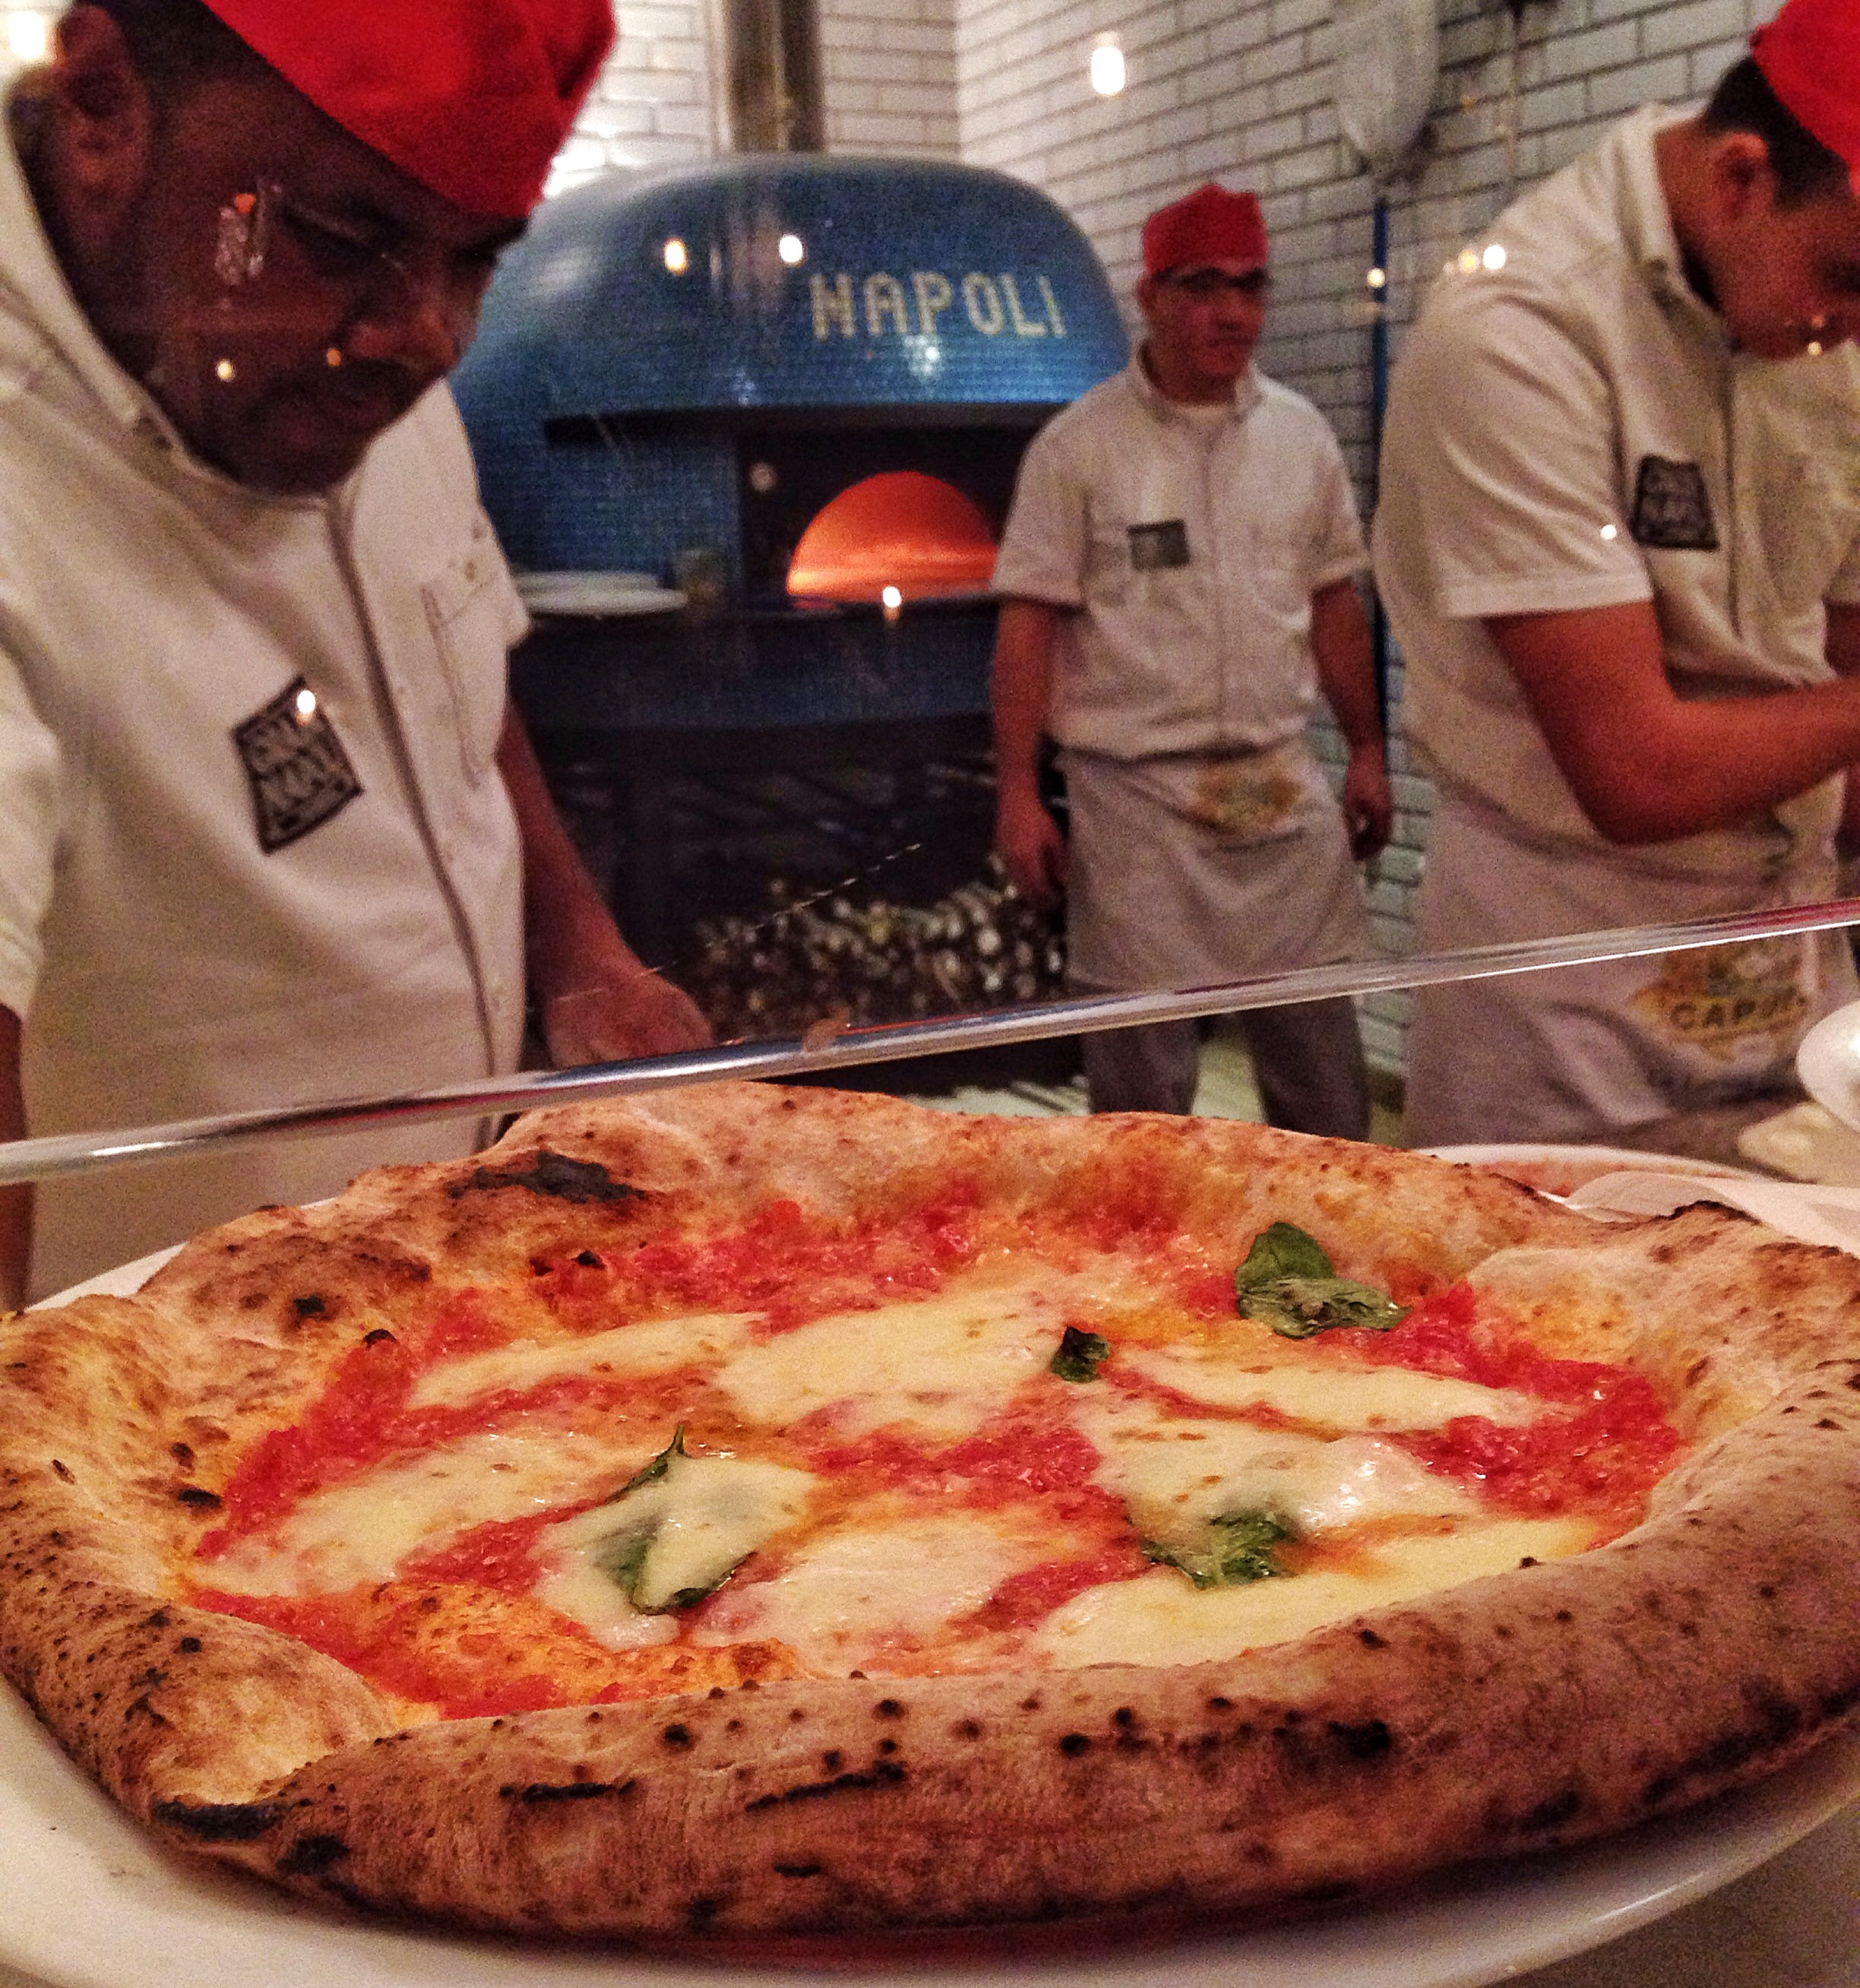 Grazie Napoli foto Cuecas na Cozinha - Grazie Napoli - pizzaria à moda de Nápoles